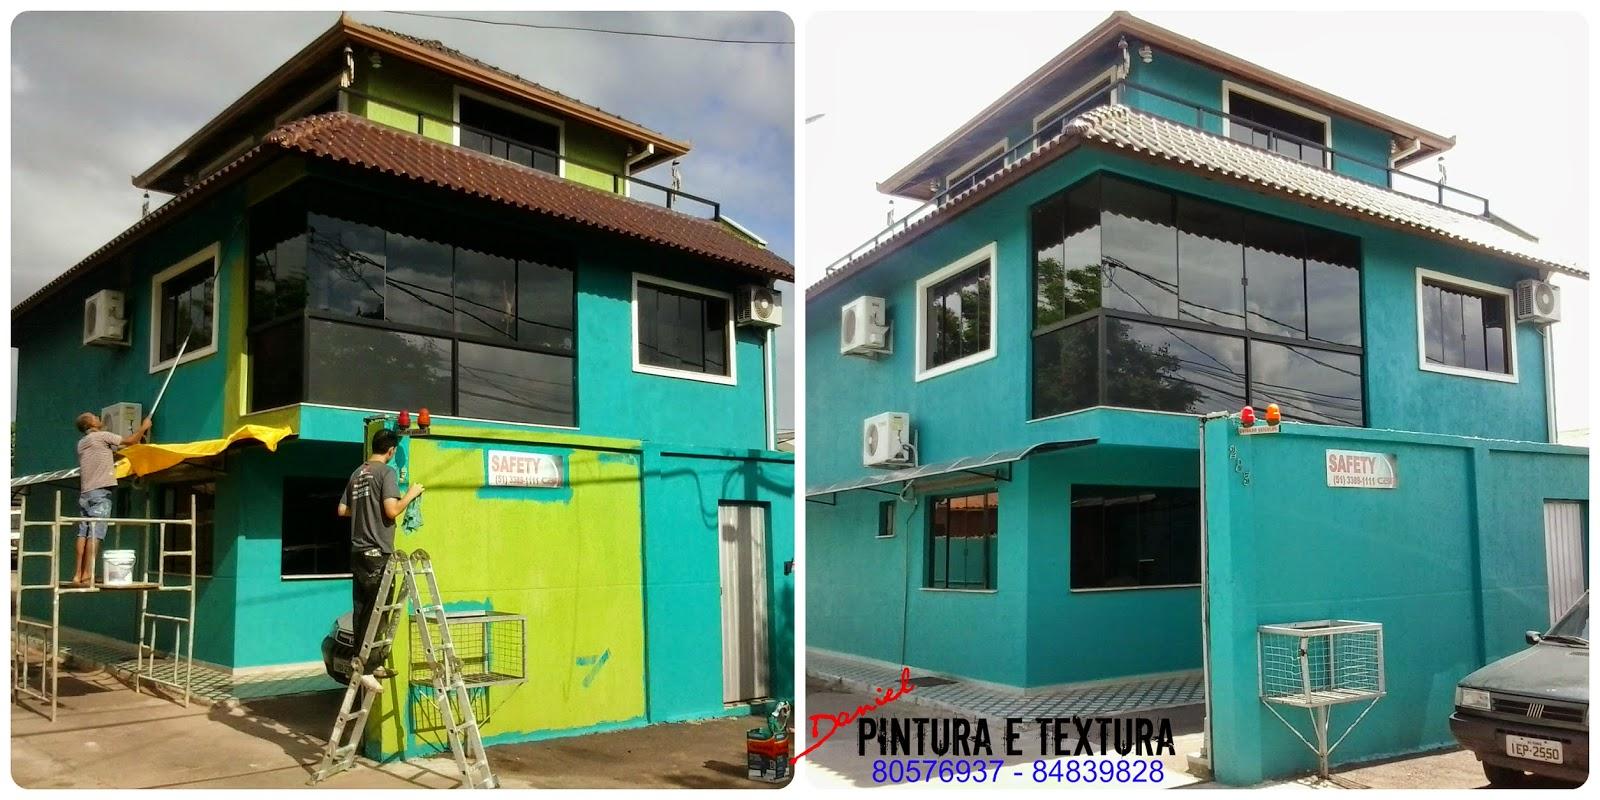 Texturas pinturas grafiato pintura de casa verde - Pinturas para la casa ...